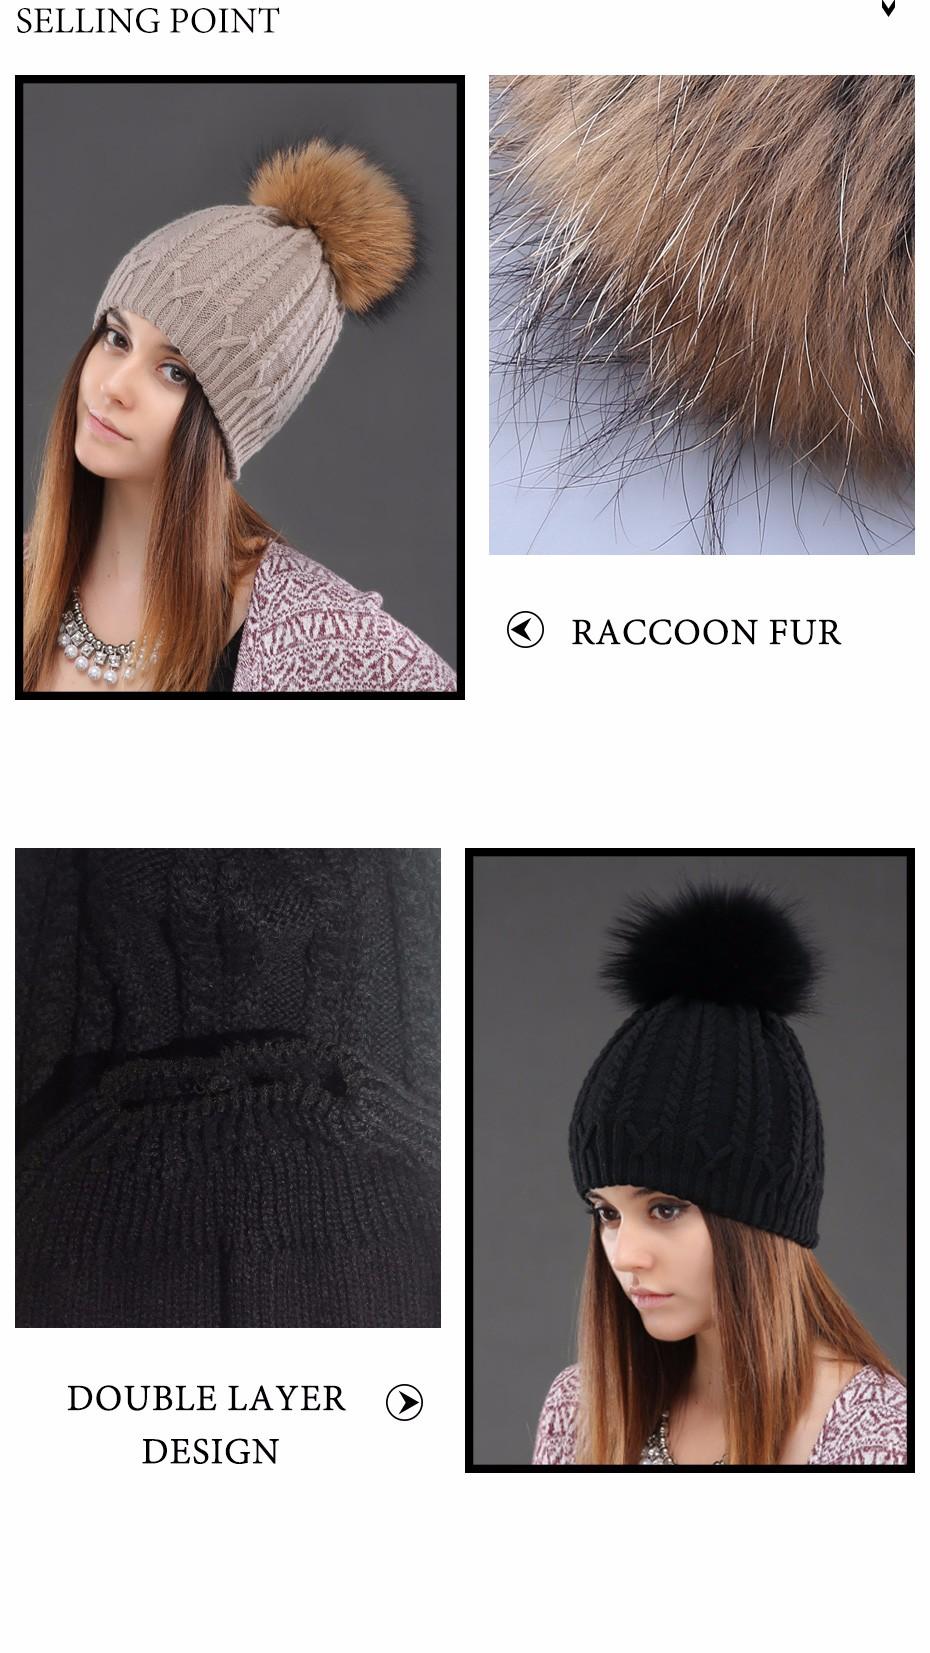 406ad4fbbca Women Double Deck Knitted Wool Hat Winter Natural Raccoon Fur Warm ...